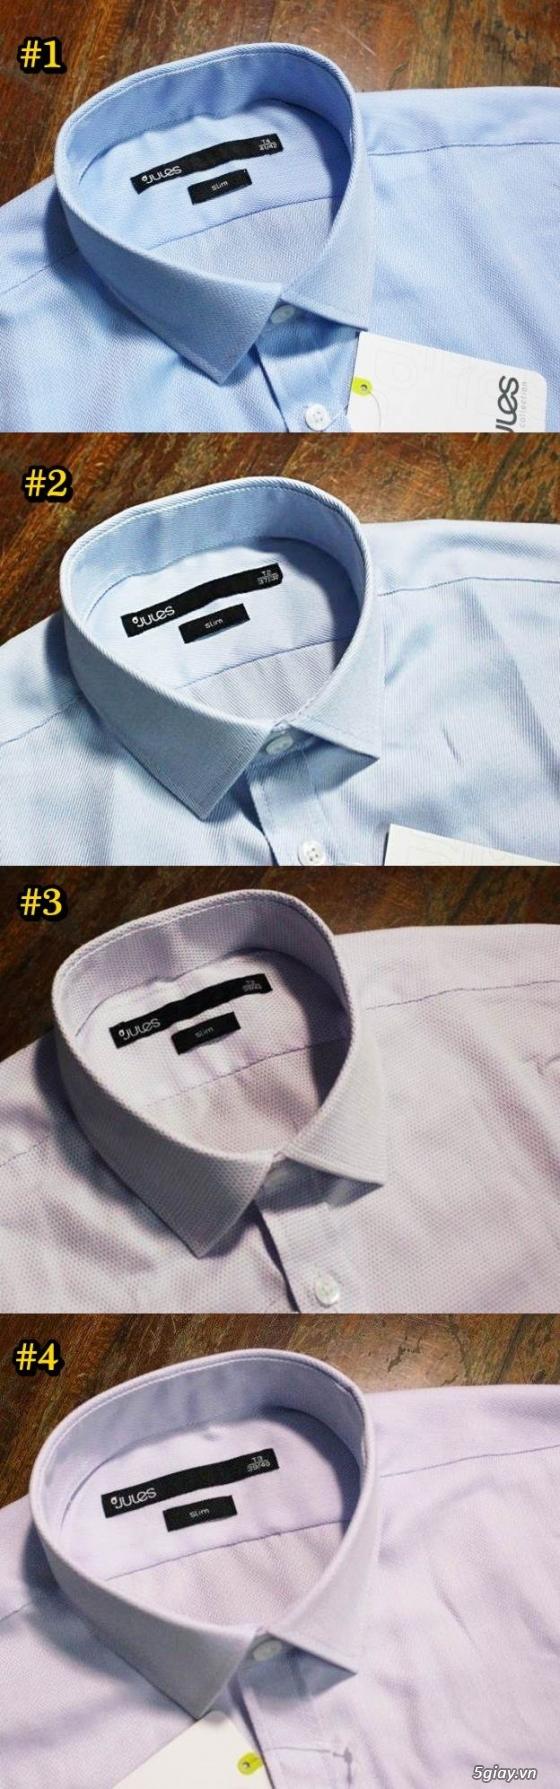 Áo thun Hollister VNXK,áo thun SuperDry VNXK ,áo A&F VNXK ,áo thun cổ tim thun láng - 19